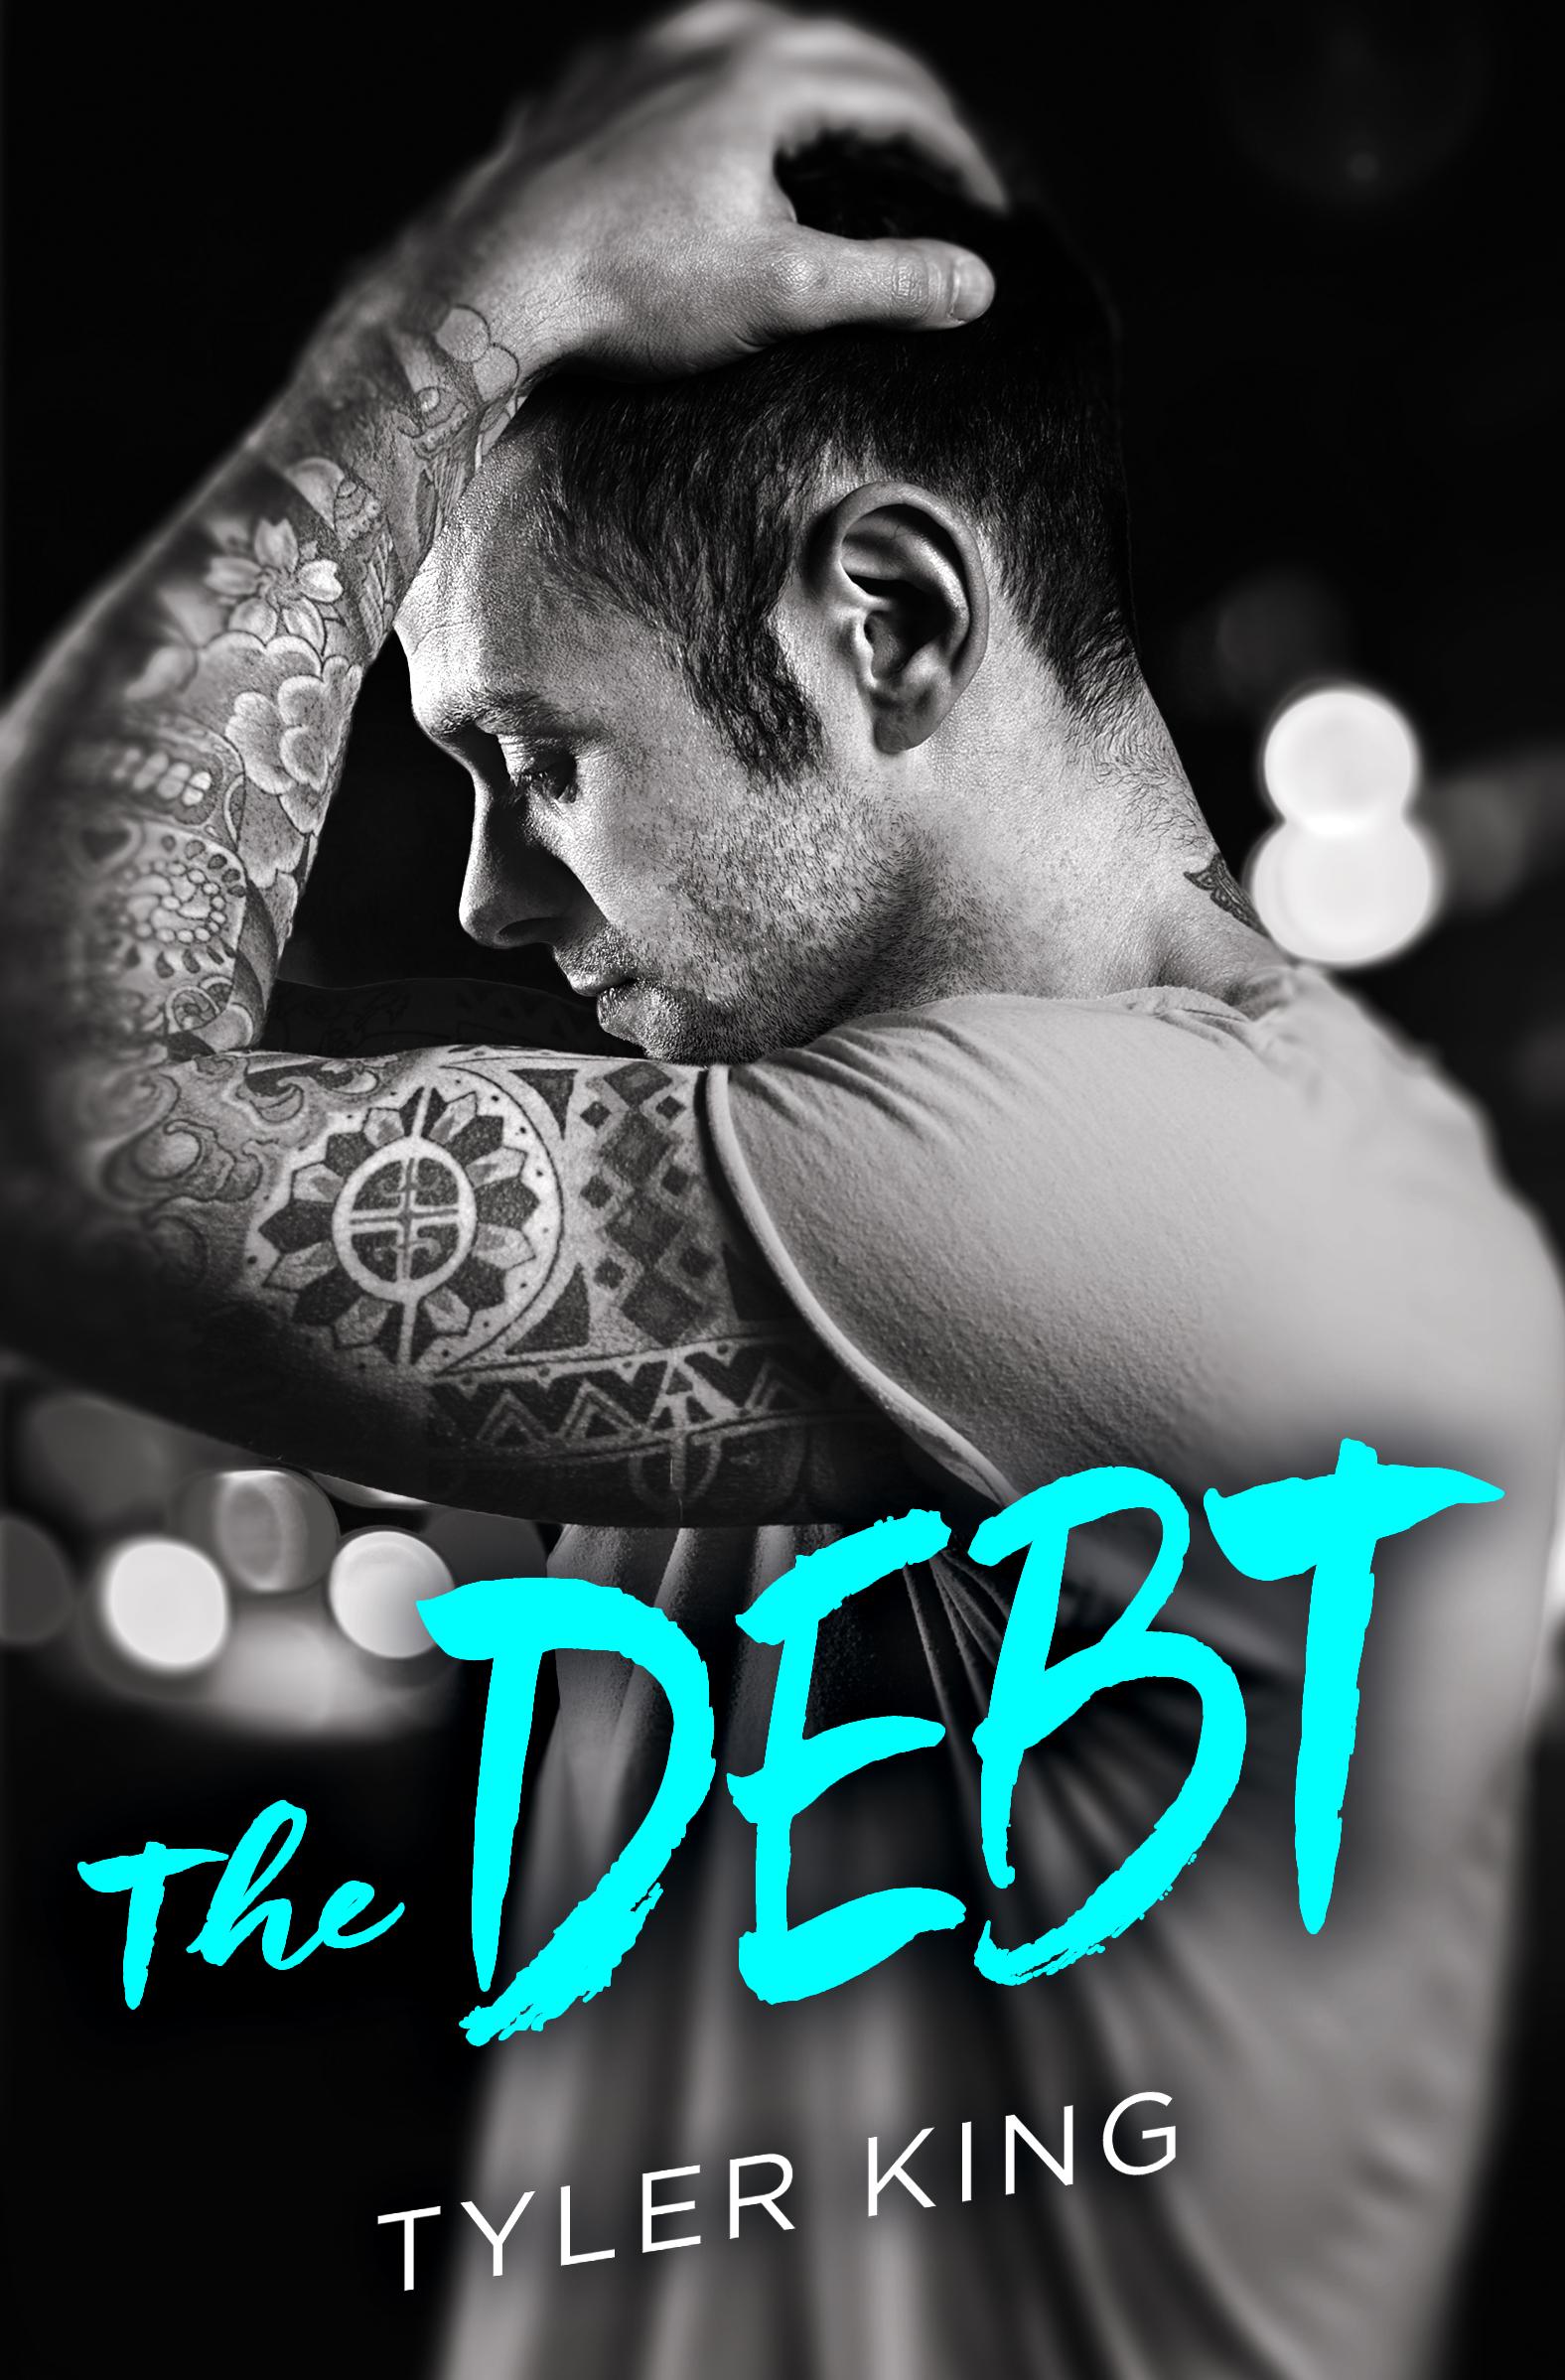 THE DEBT Cover – Tyler King